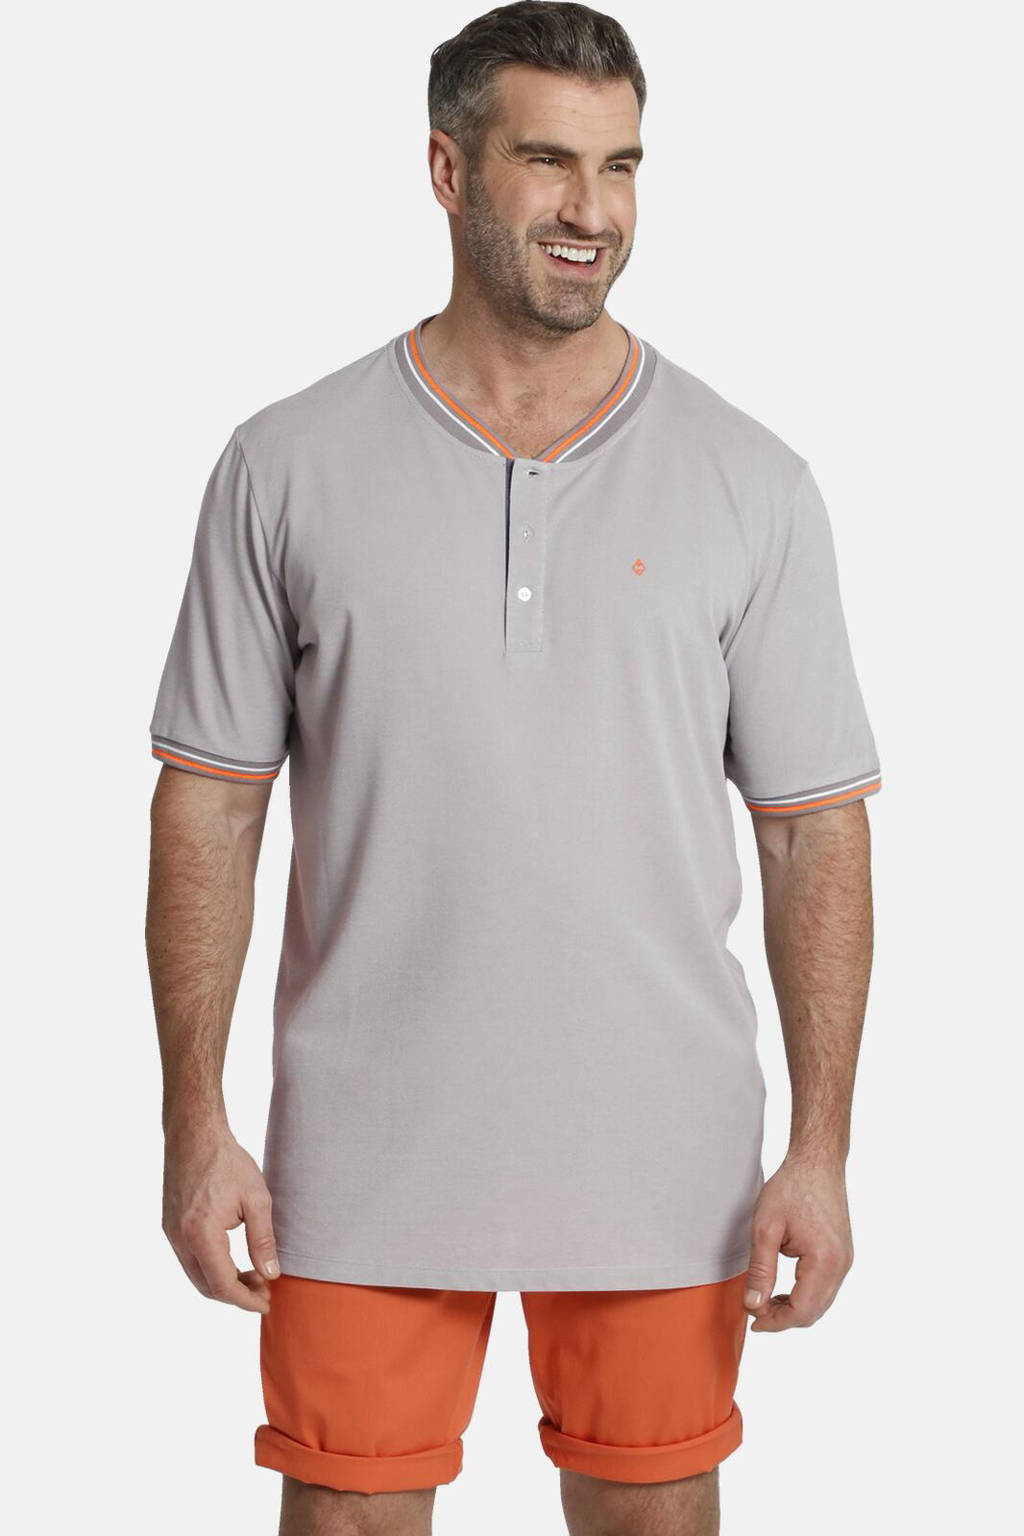 Charles Colby T-shirt Earl Maroon Plus Size met contrastbies grijs, Grijs